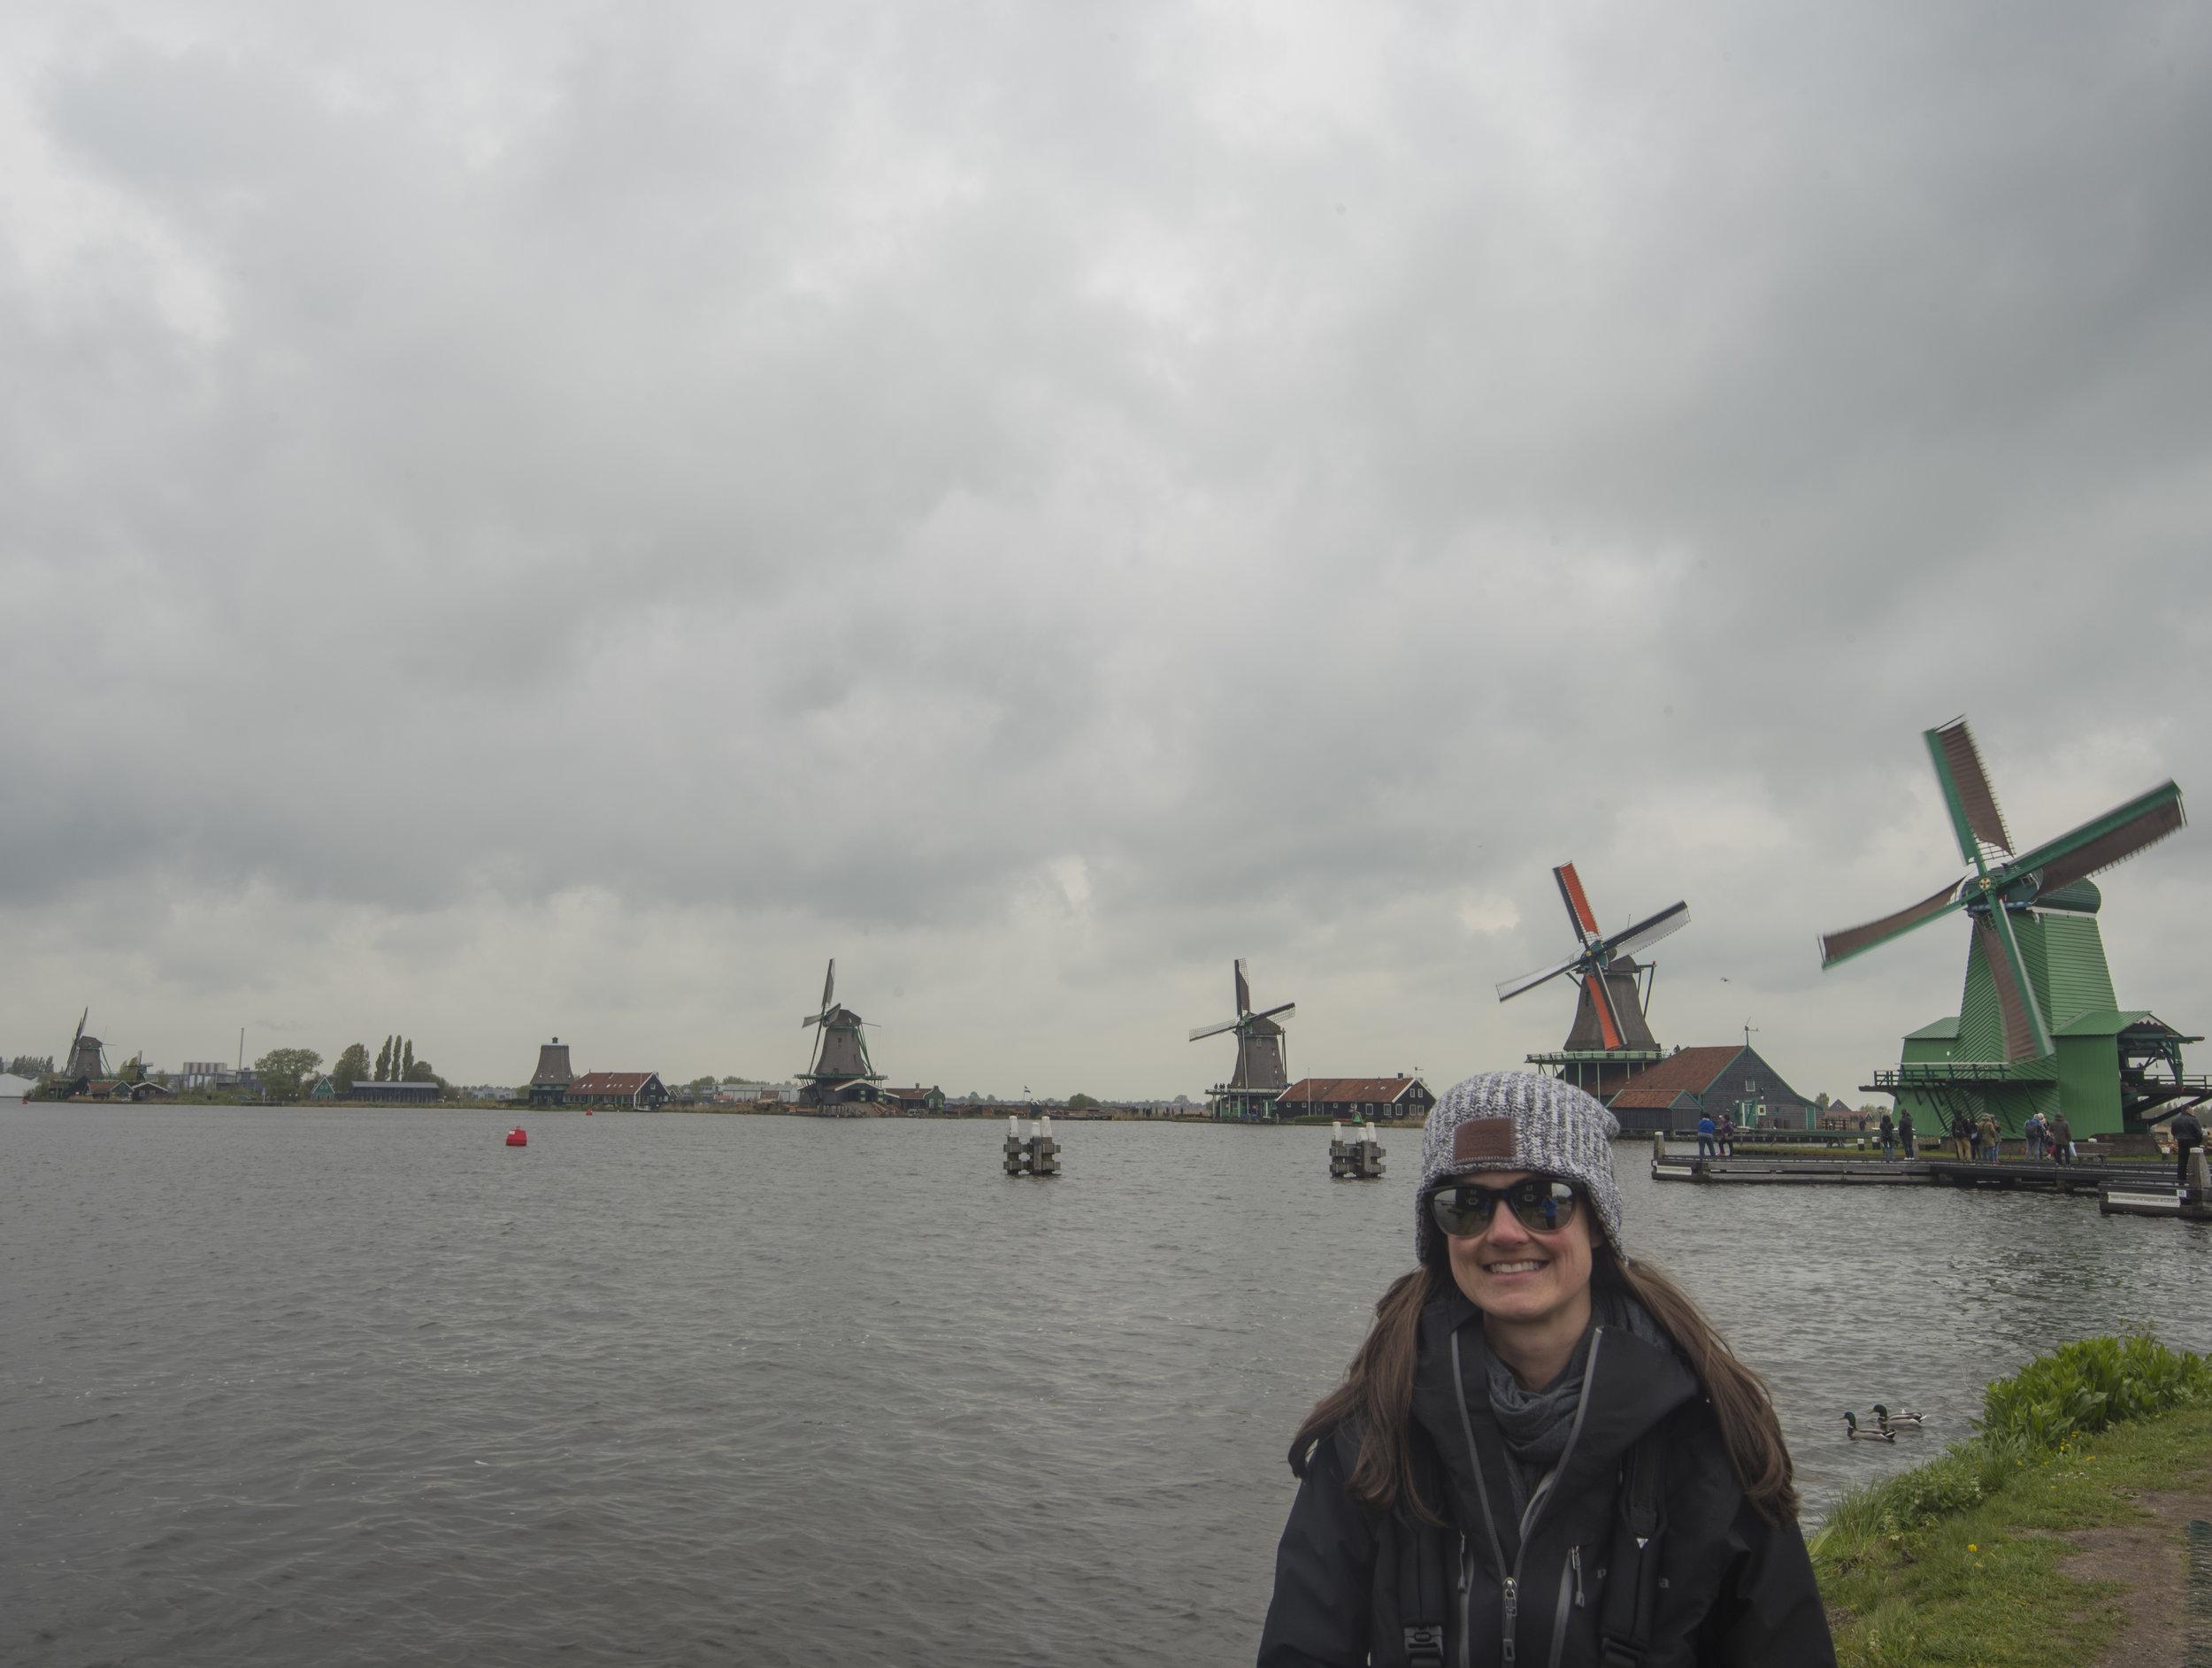 20170424-Holland-051.jpg